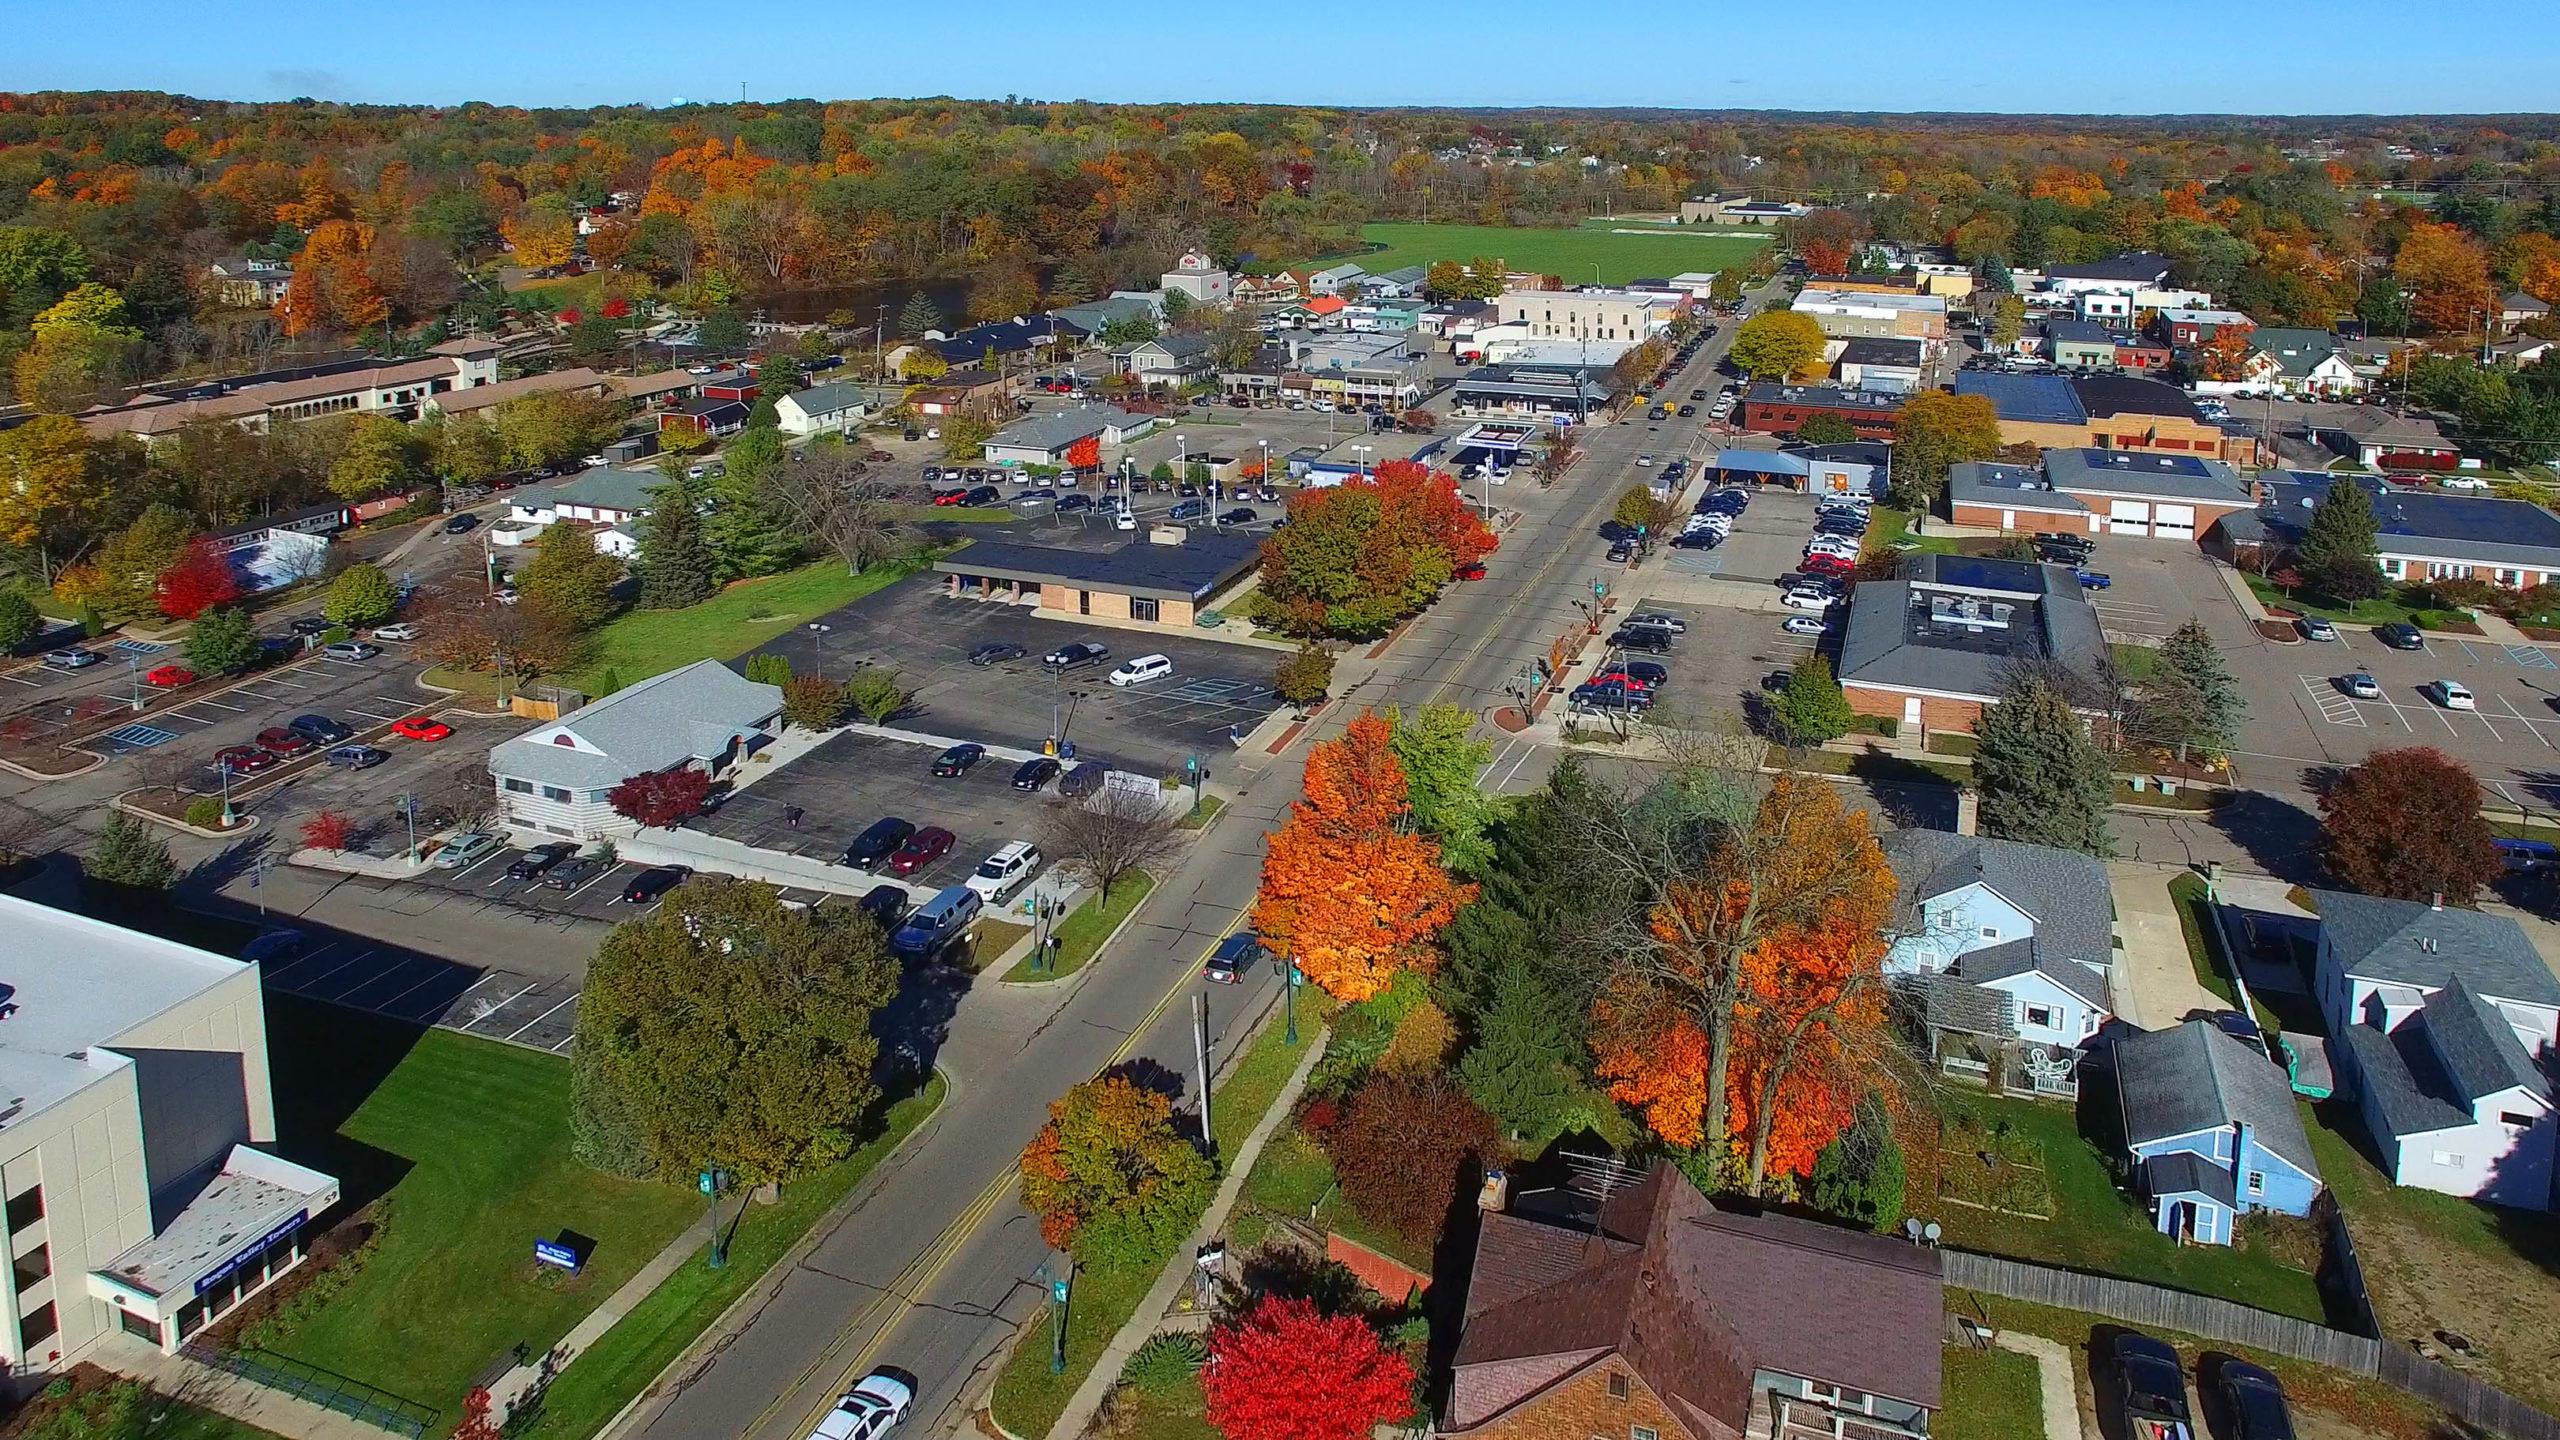 Ariel view of downtown Rockford Michigan